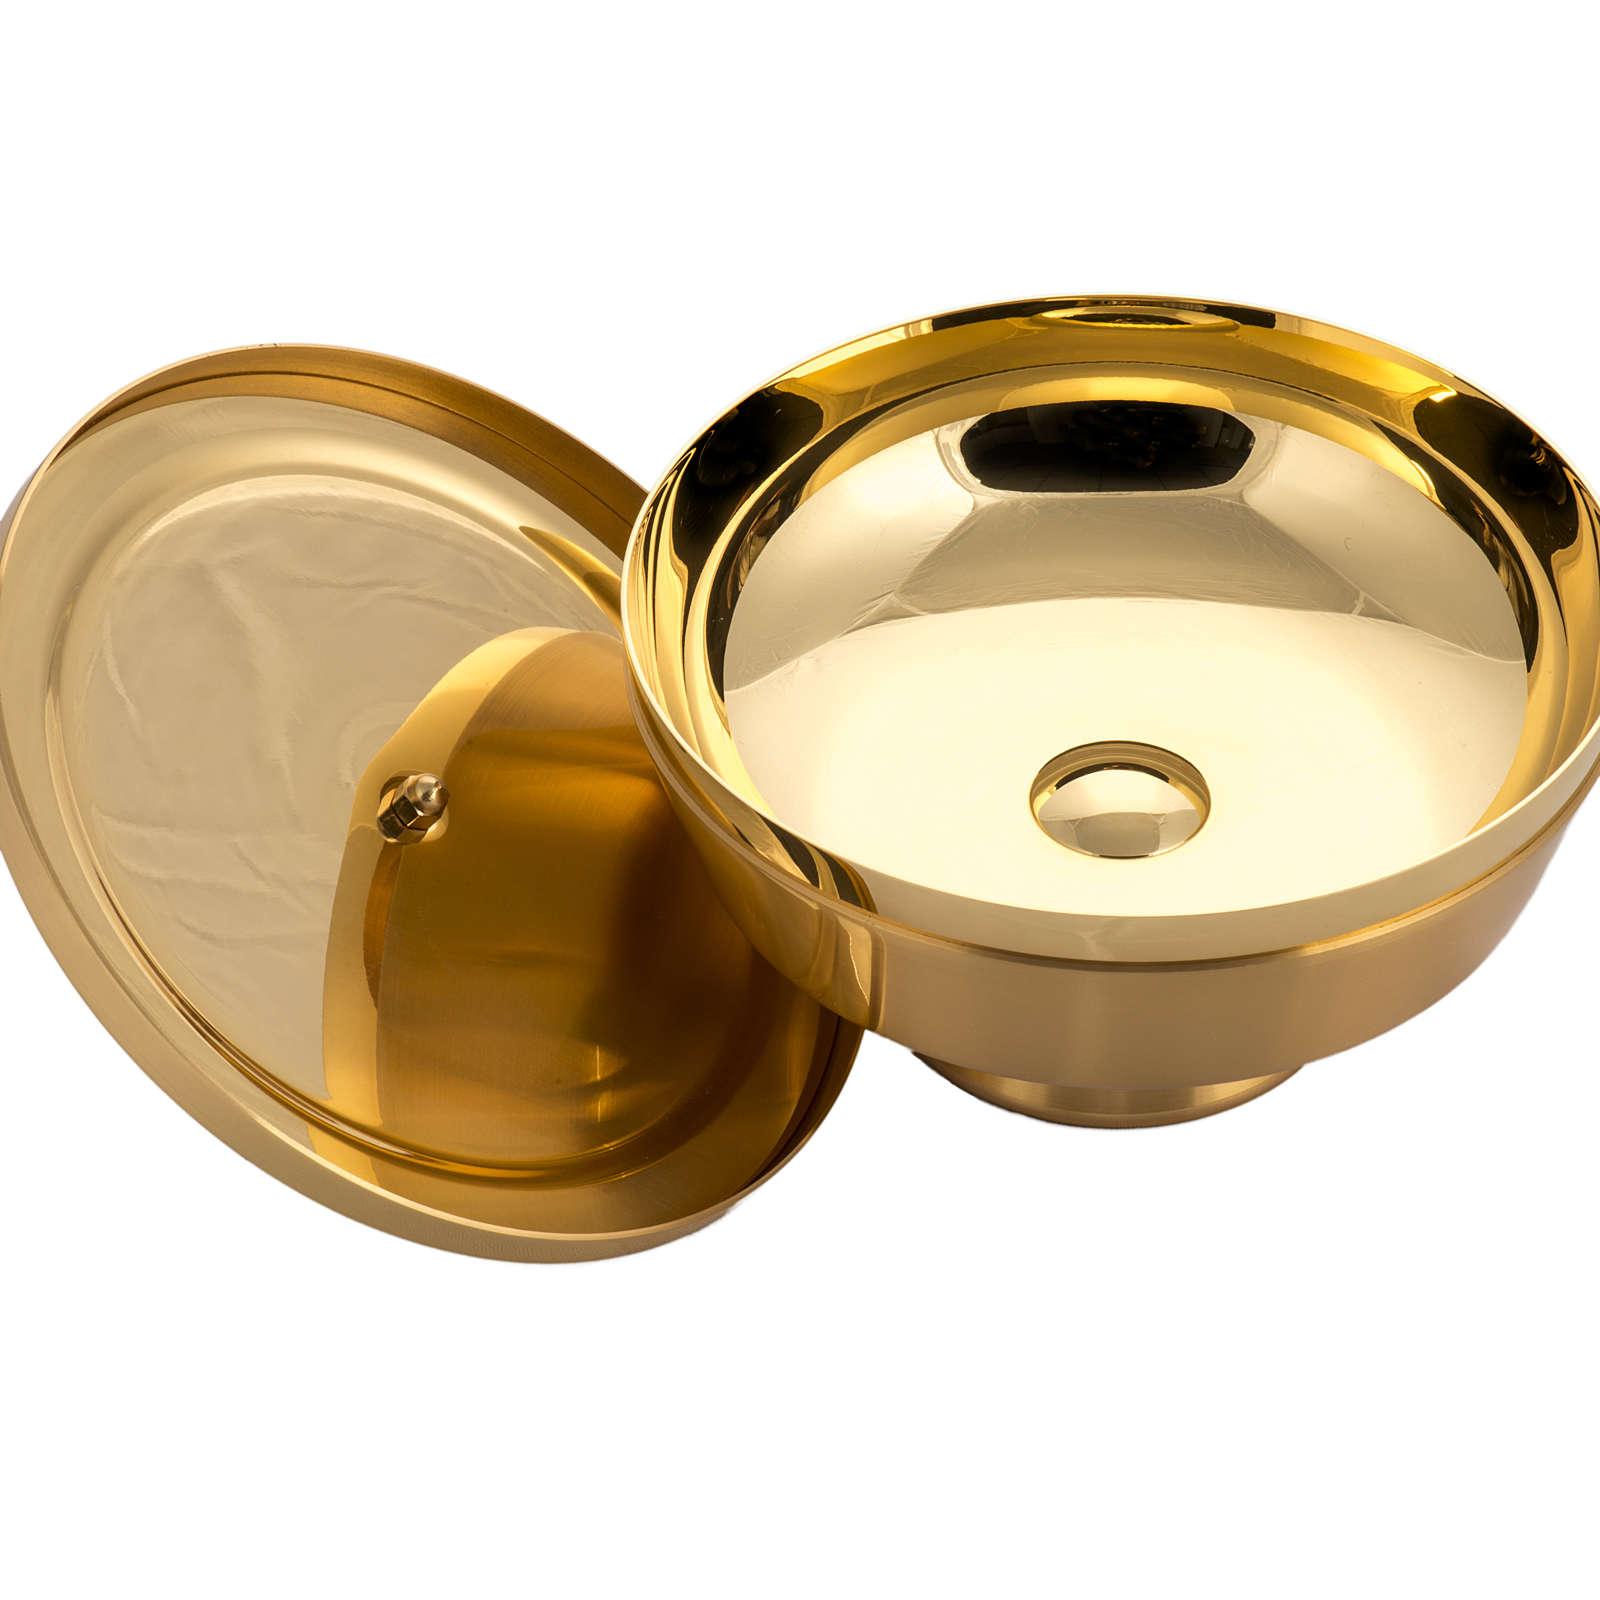 Pisside bassa satinata ottone dorato 4